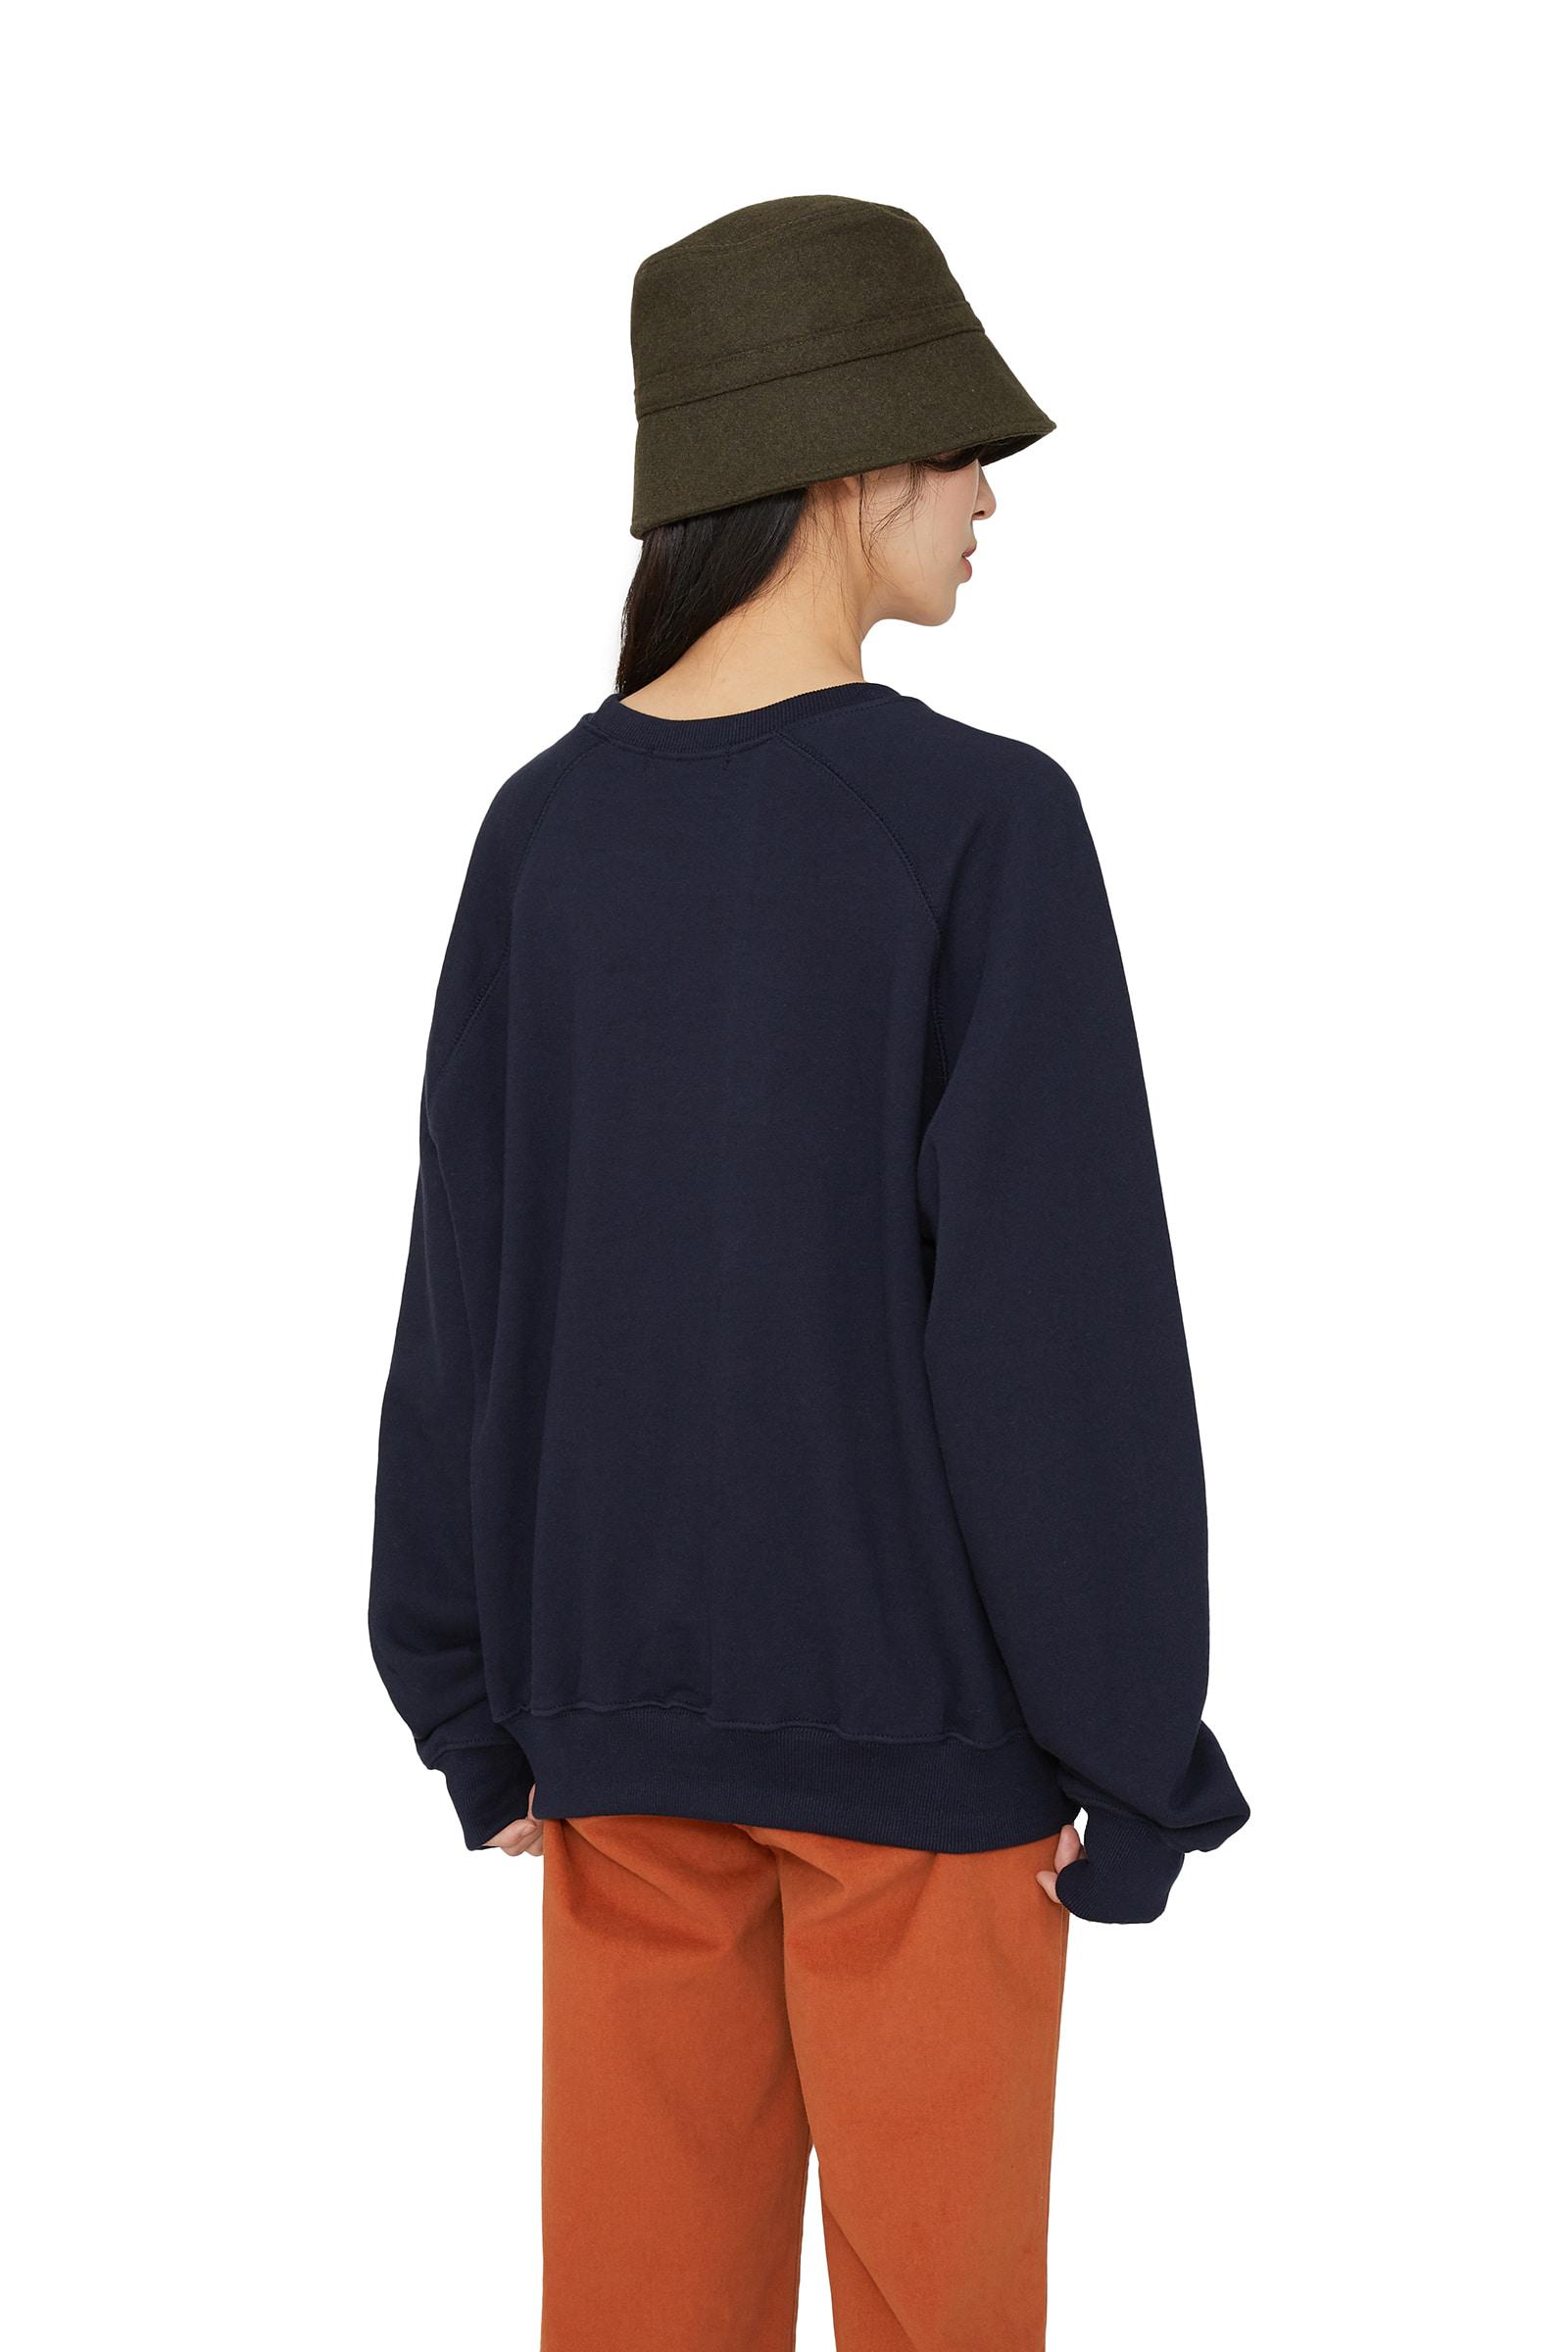 Tennis printed crew neck sweatshirt